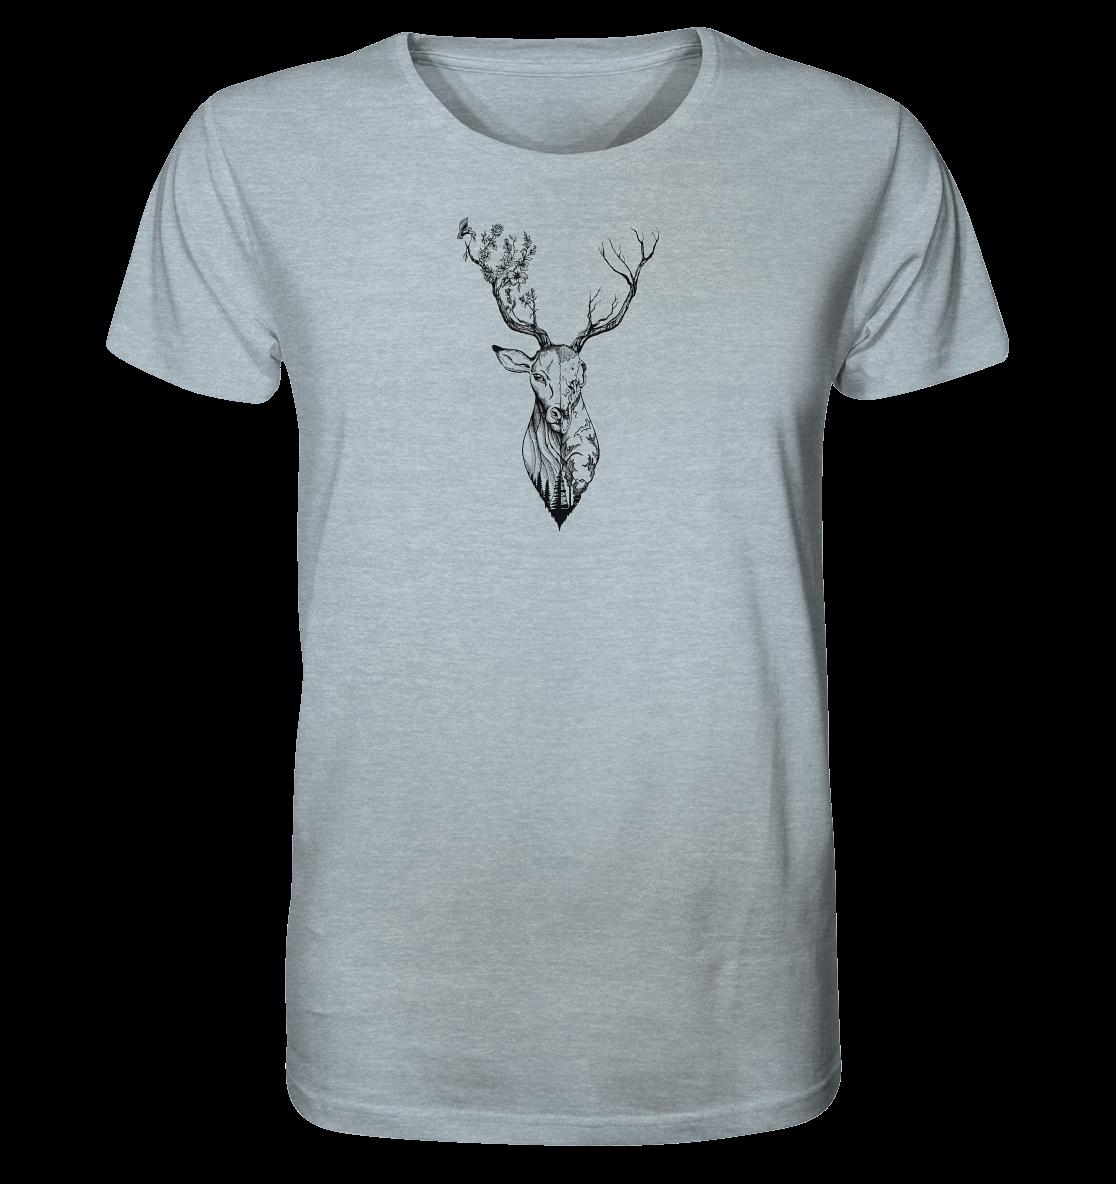 front-organic-shirt-meliert-adbfcb-1116x-8.png